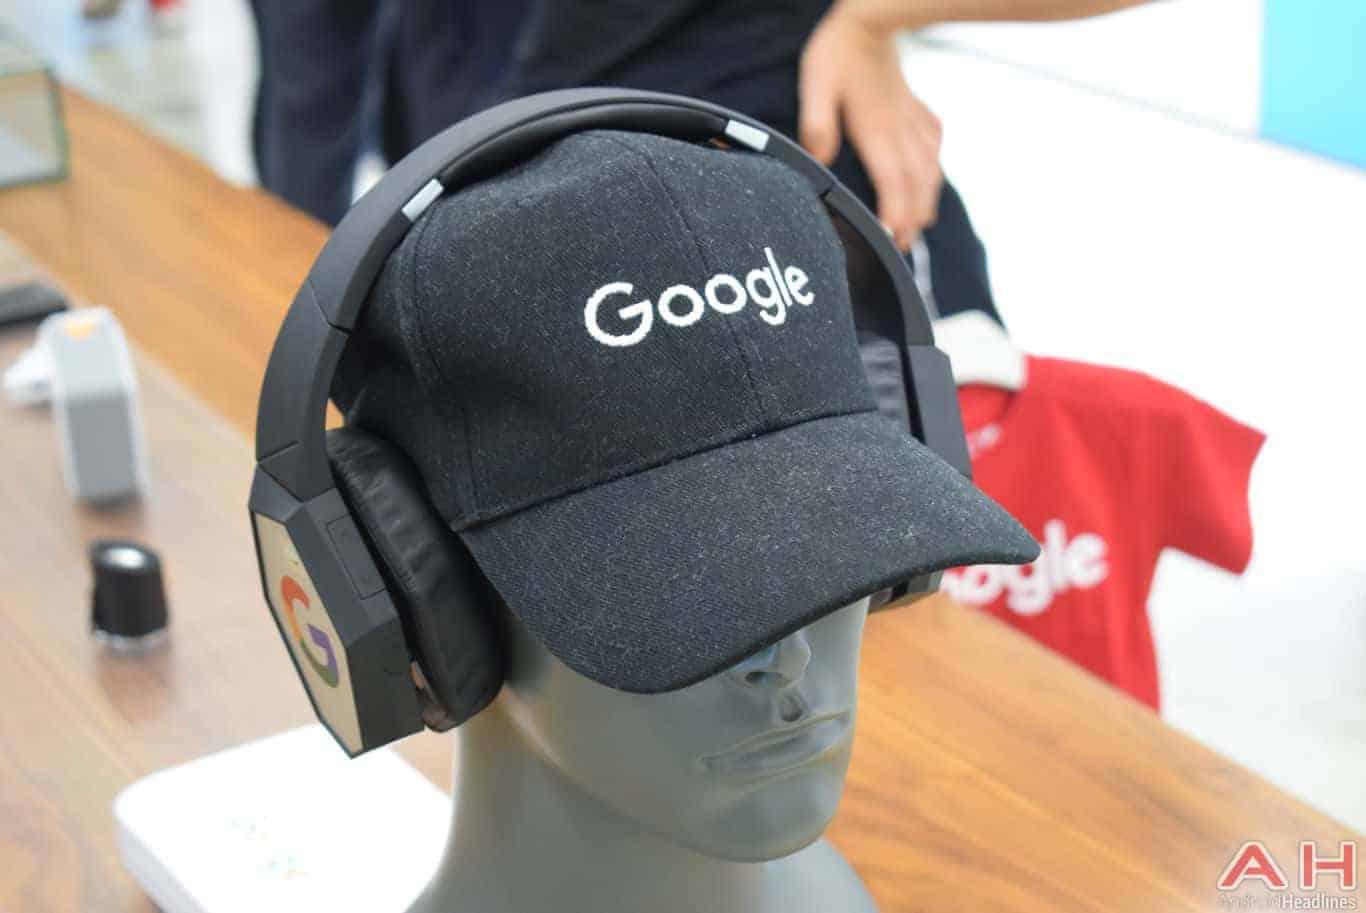 Googleplex Google Store Branding AH 8